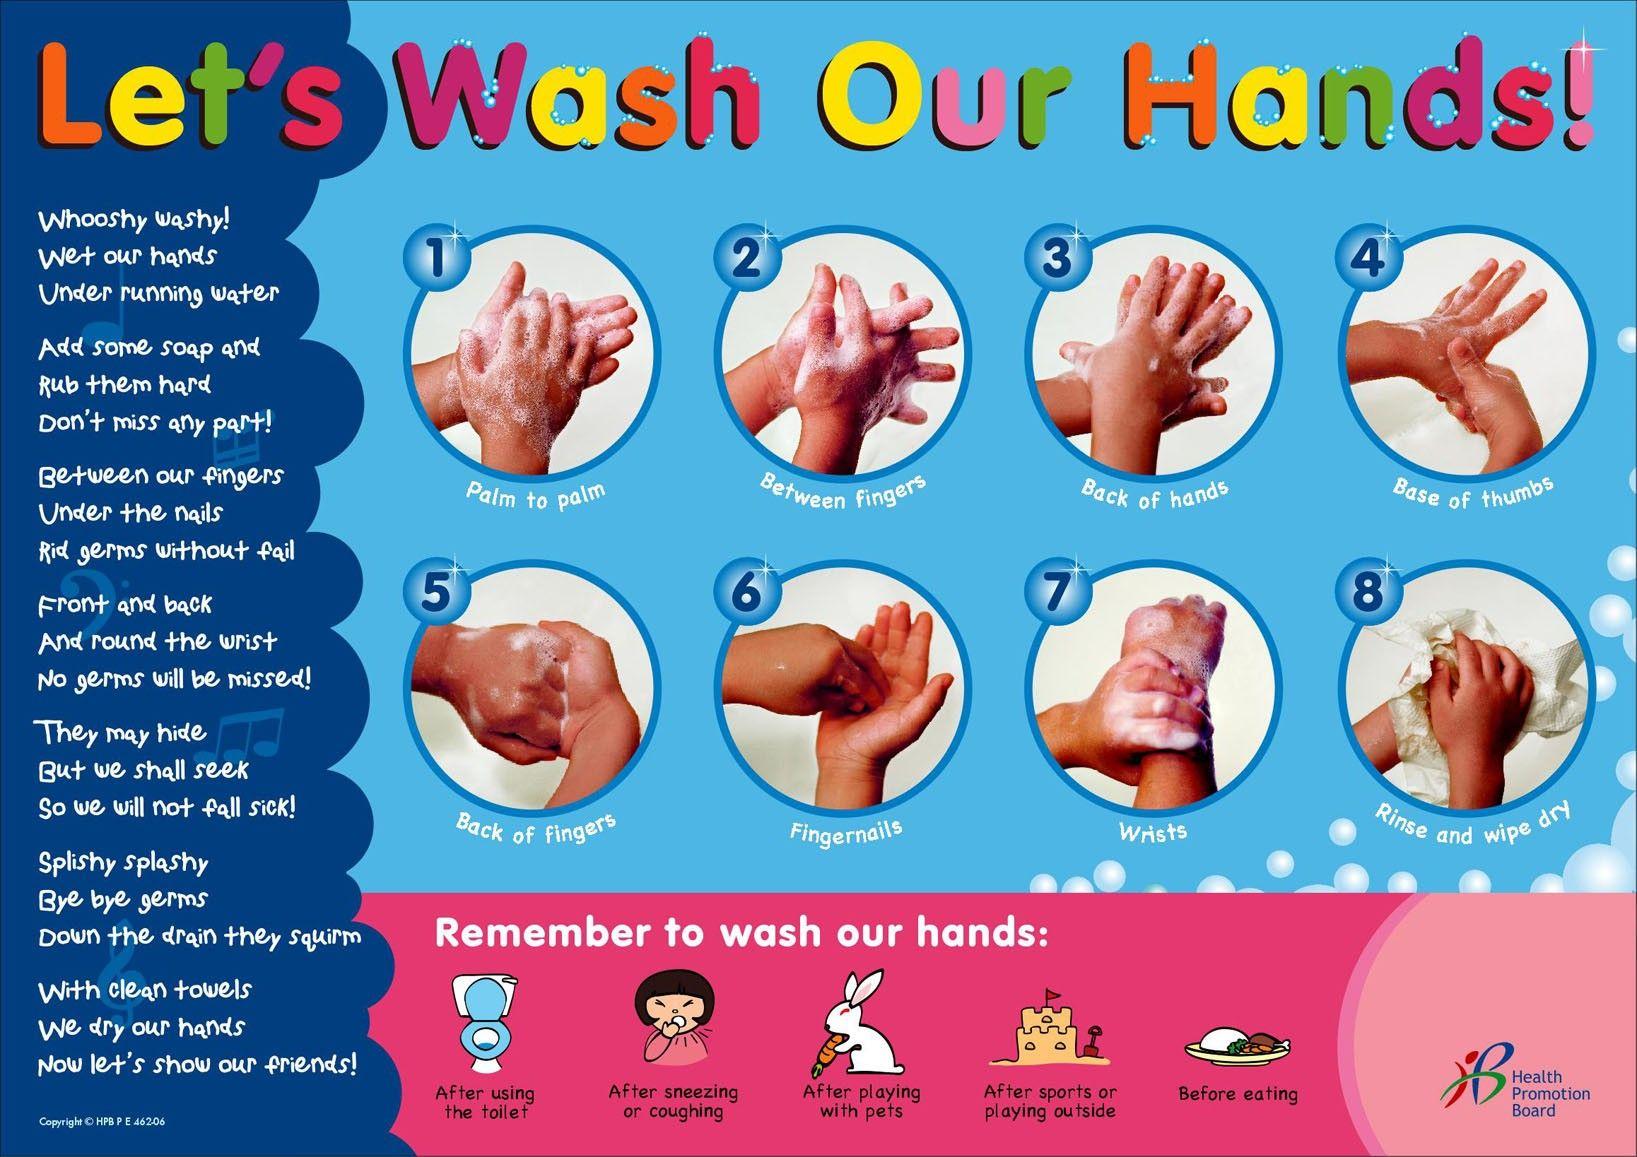 17 Best images about Handwashing 101 on Pinterest | Hand washing ...